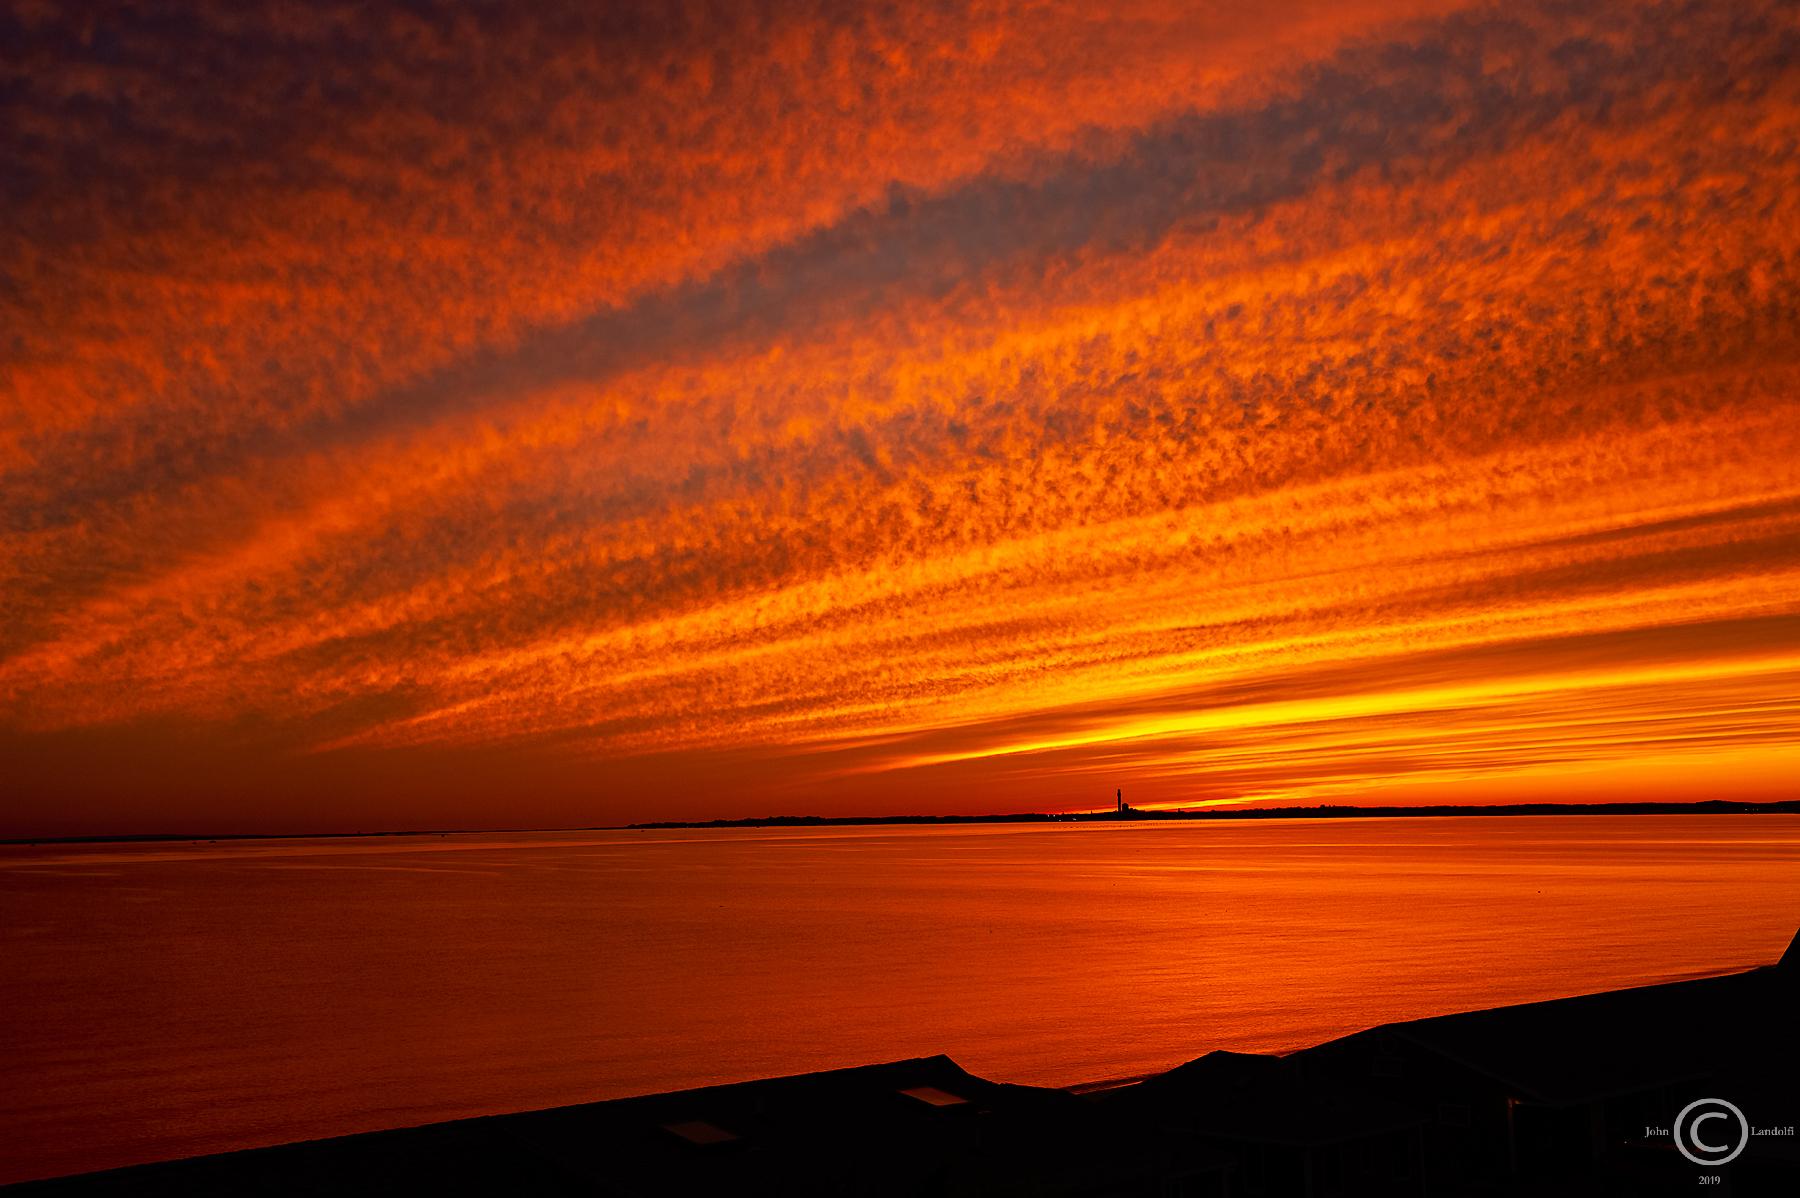 Cape-Cod-2019-Sunset-No3